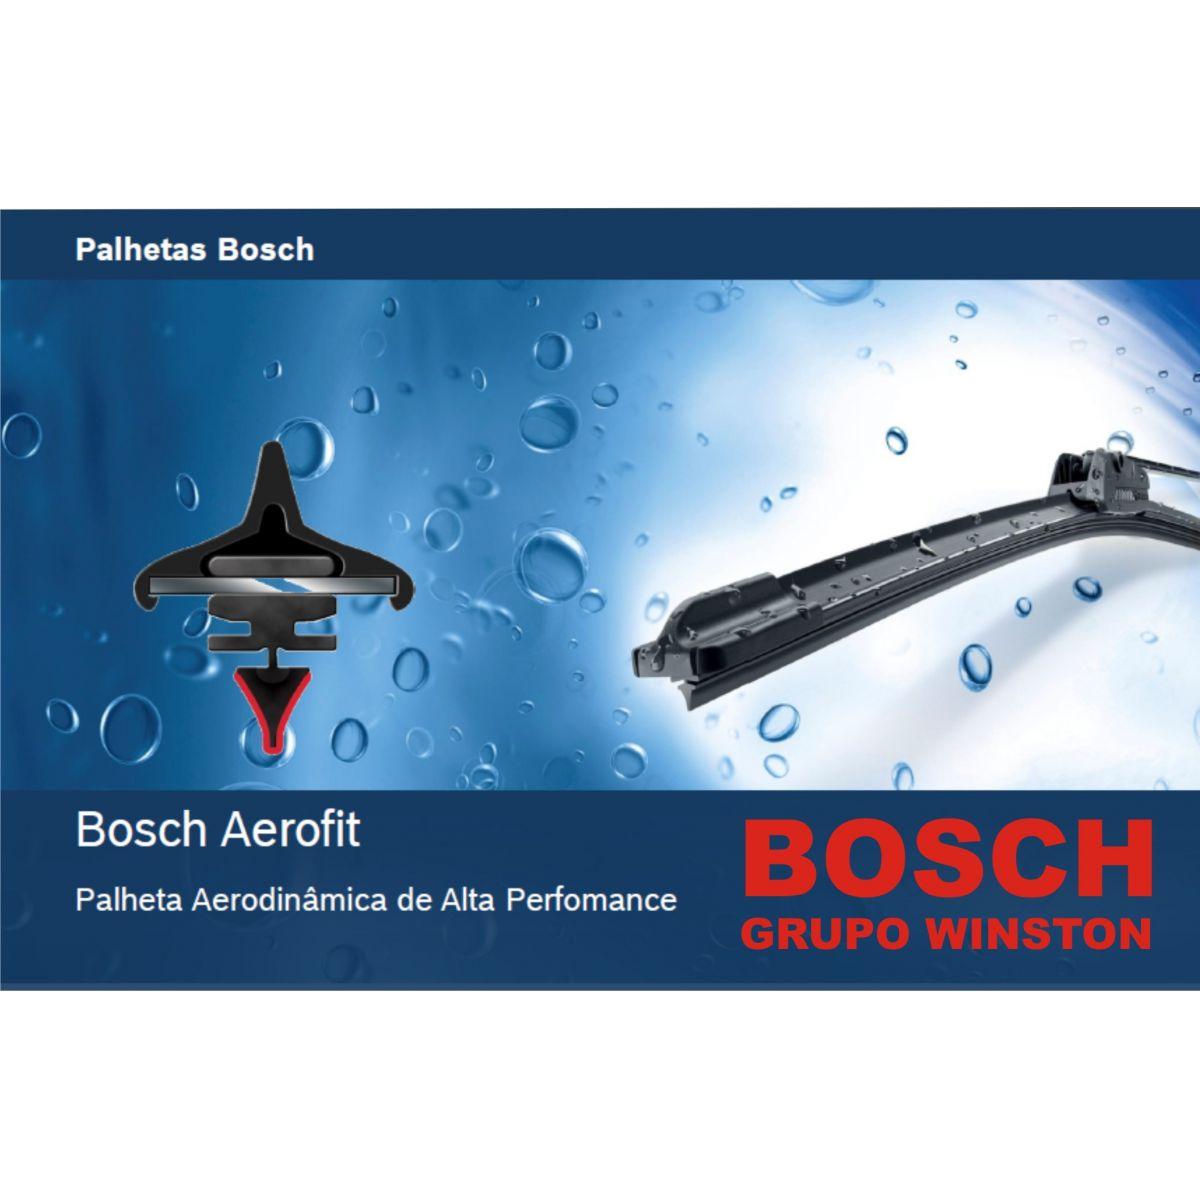 Palheta Bosch Aerofit Limpador de para brisa Bosch NISSAN 350 Z